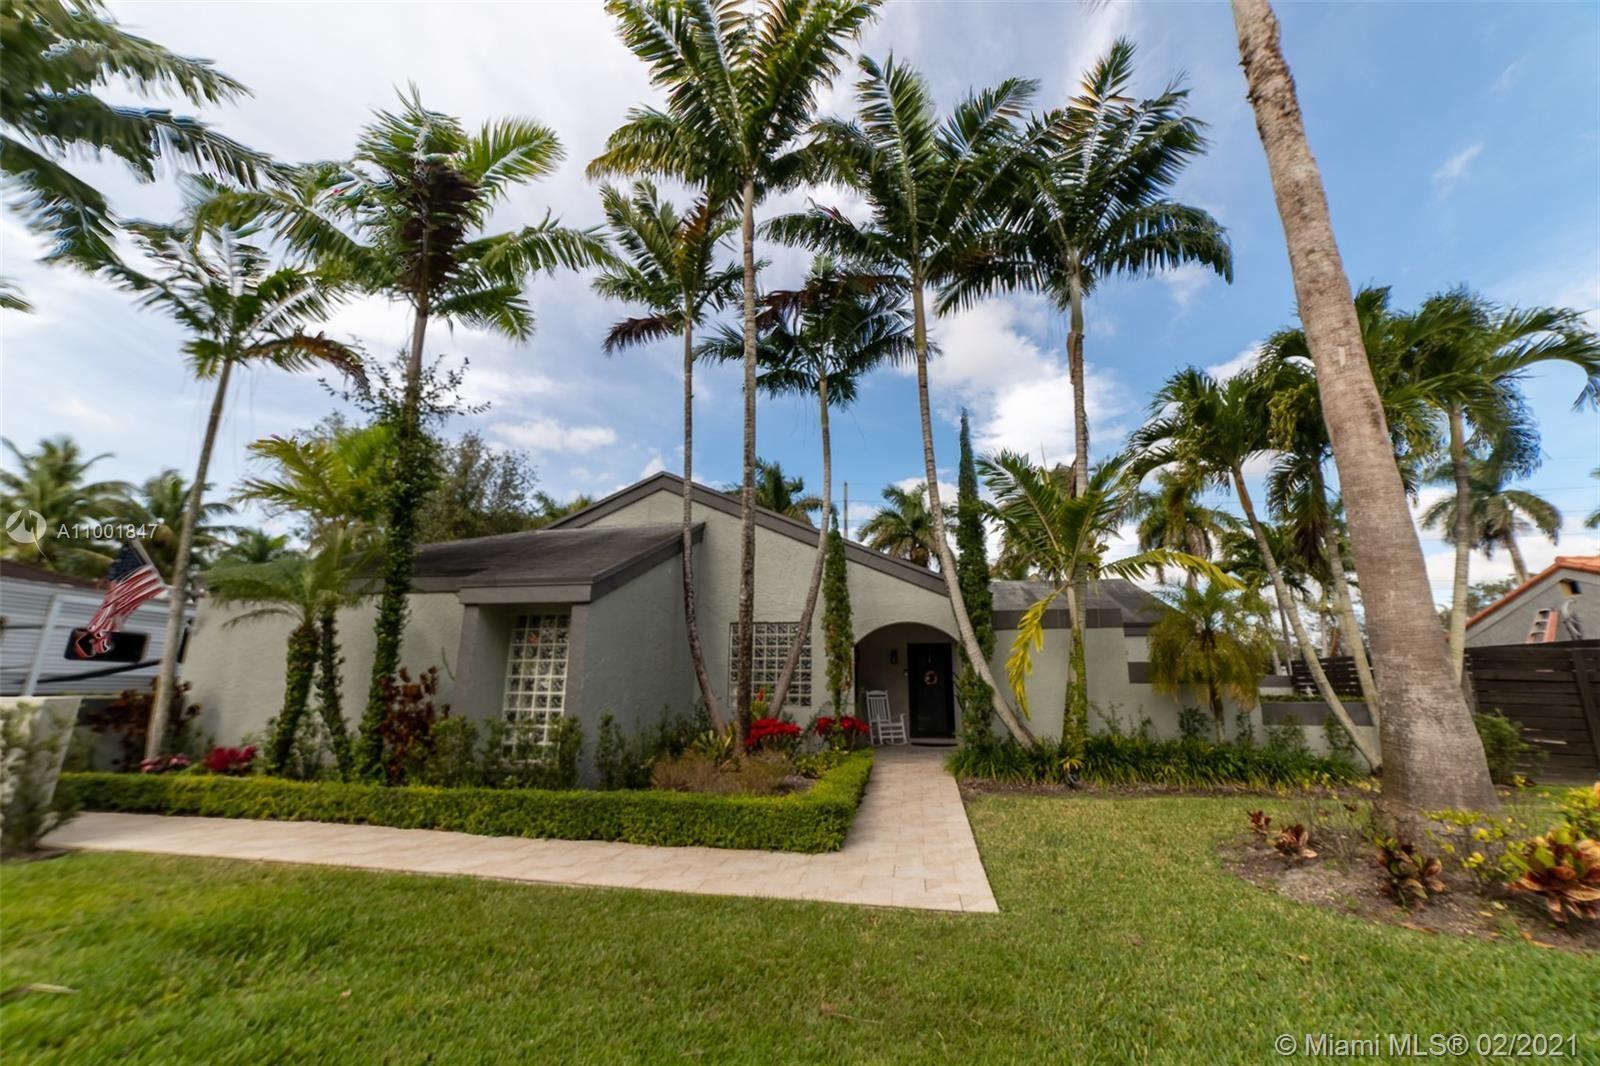 15281 SW 152nd Ter, Miami, FL 33187 - #: A11001847